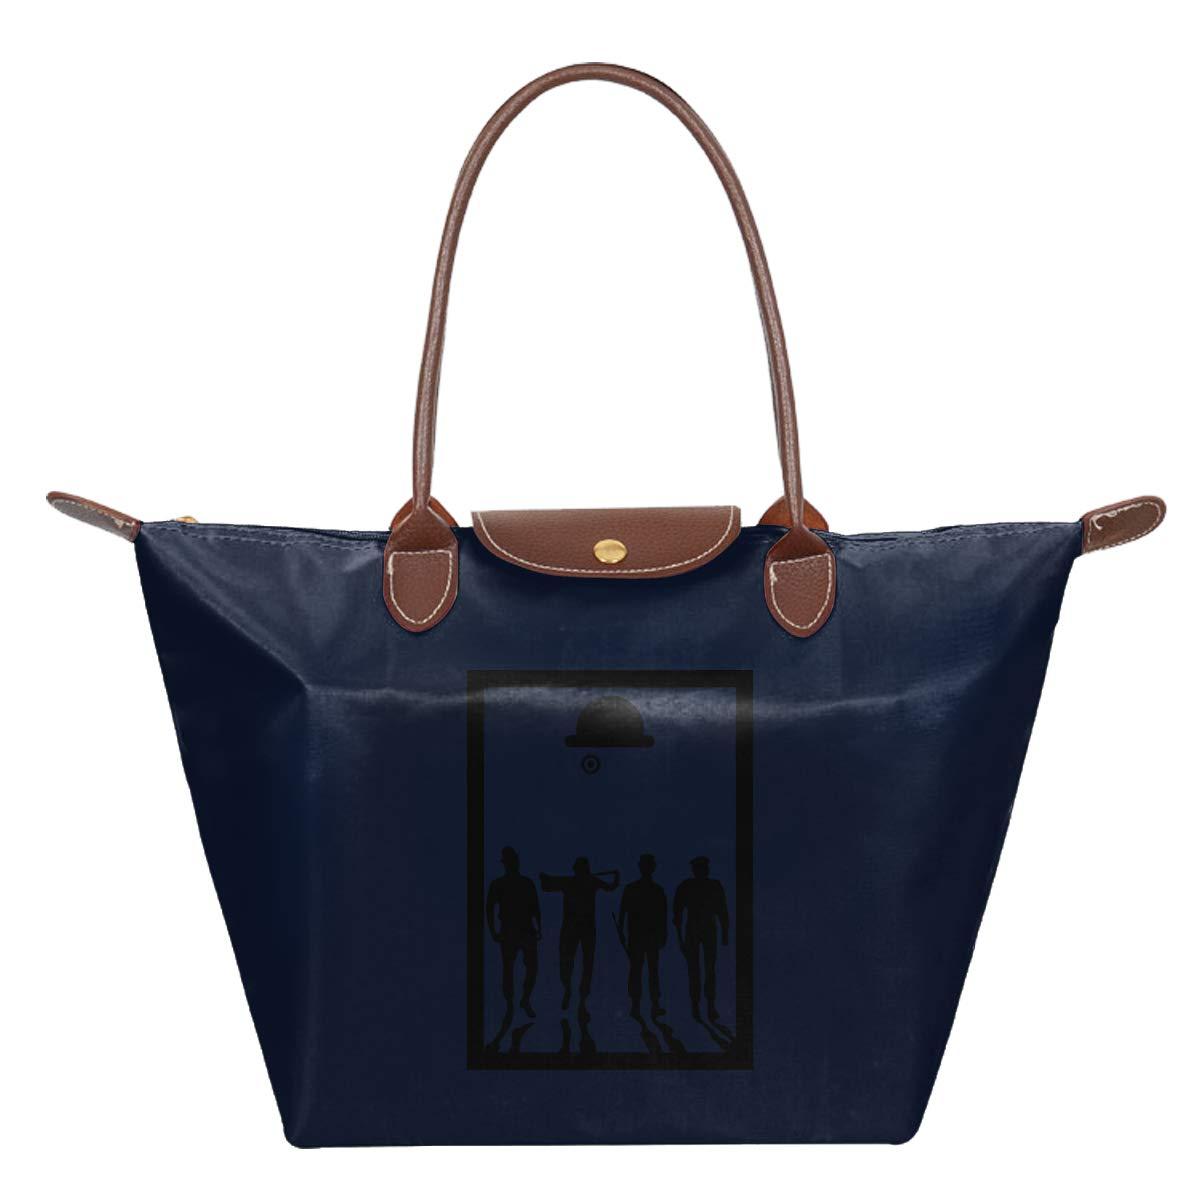 A Clockwork Orange Frame Movie Silhouette Waterproof Leather Folded Messenger Nylon Bag Travel Tote Hopping Folding School Handbags